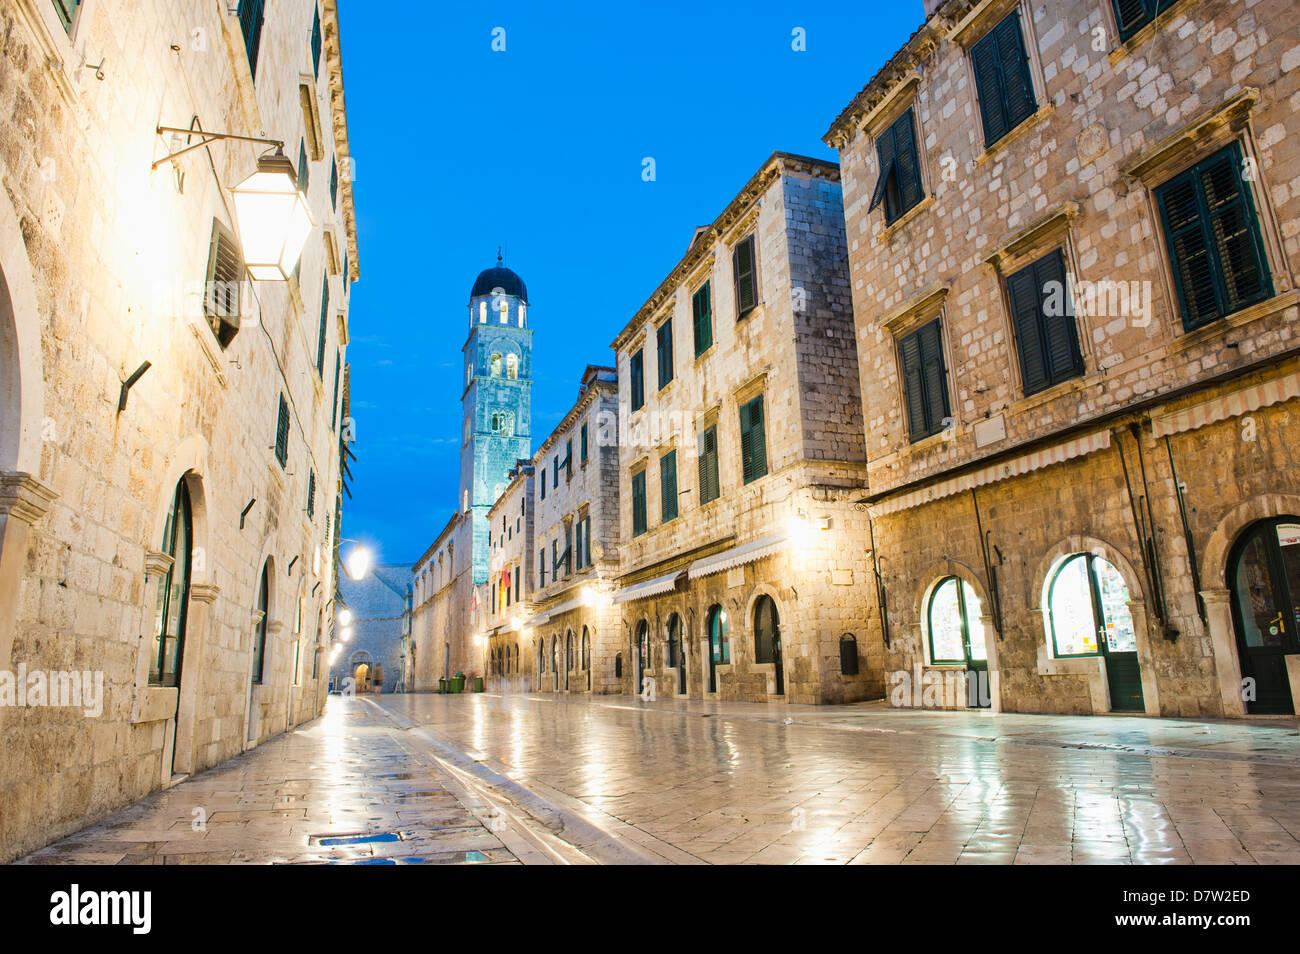 Dubrovnik Old Town, Franciscan Monastery on Stradun, UNESCO World Heritage Site, Dubrovnik, Dalmatia, Croatia - Stock Image